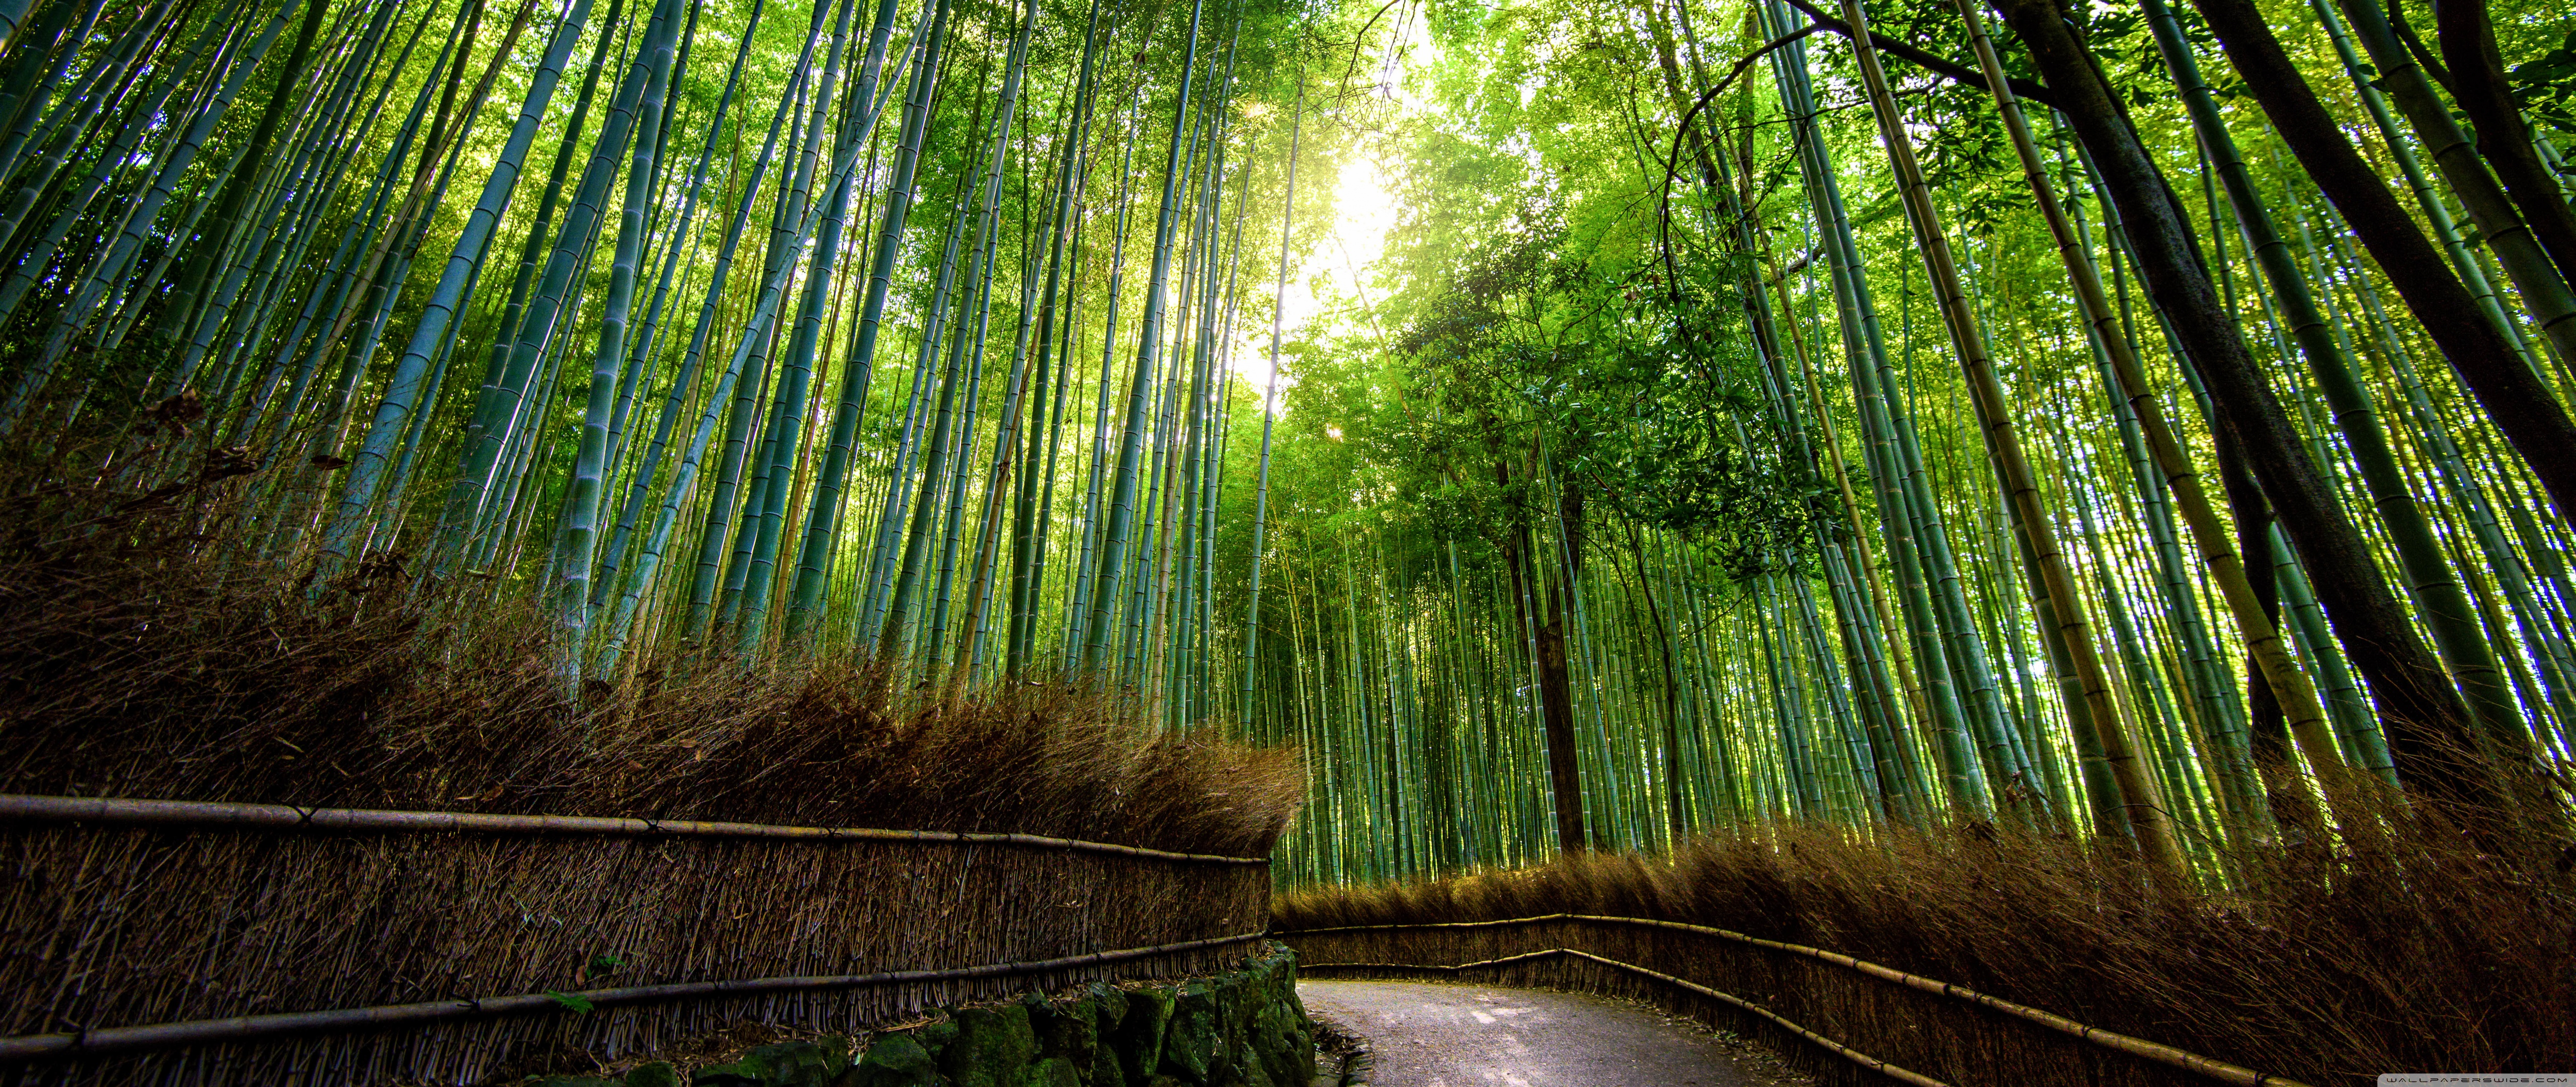 bamboo forest, kyoto, japan ❤ 4k hd desktop wallpaper for 4k ultra